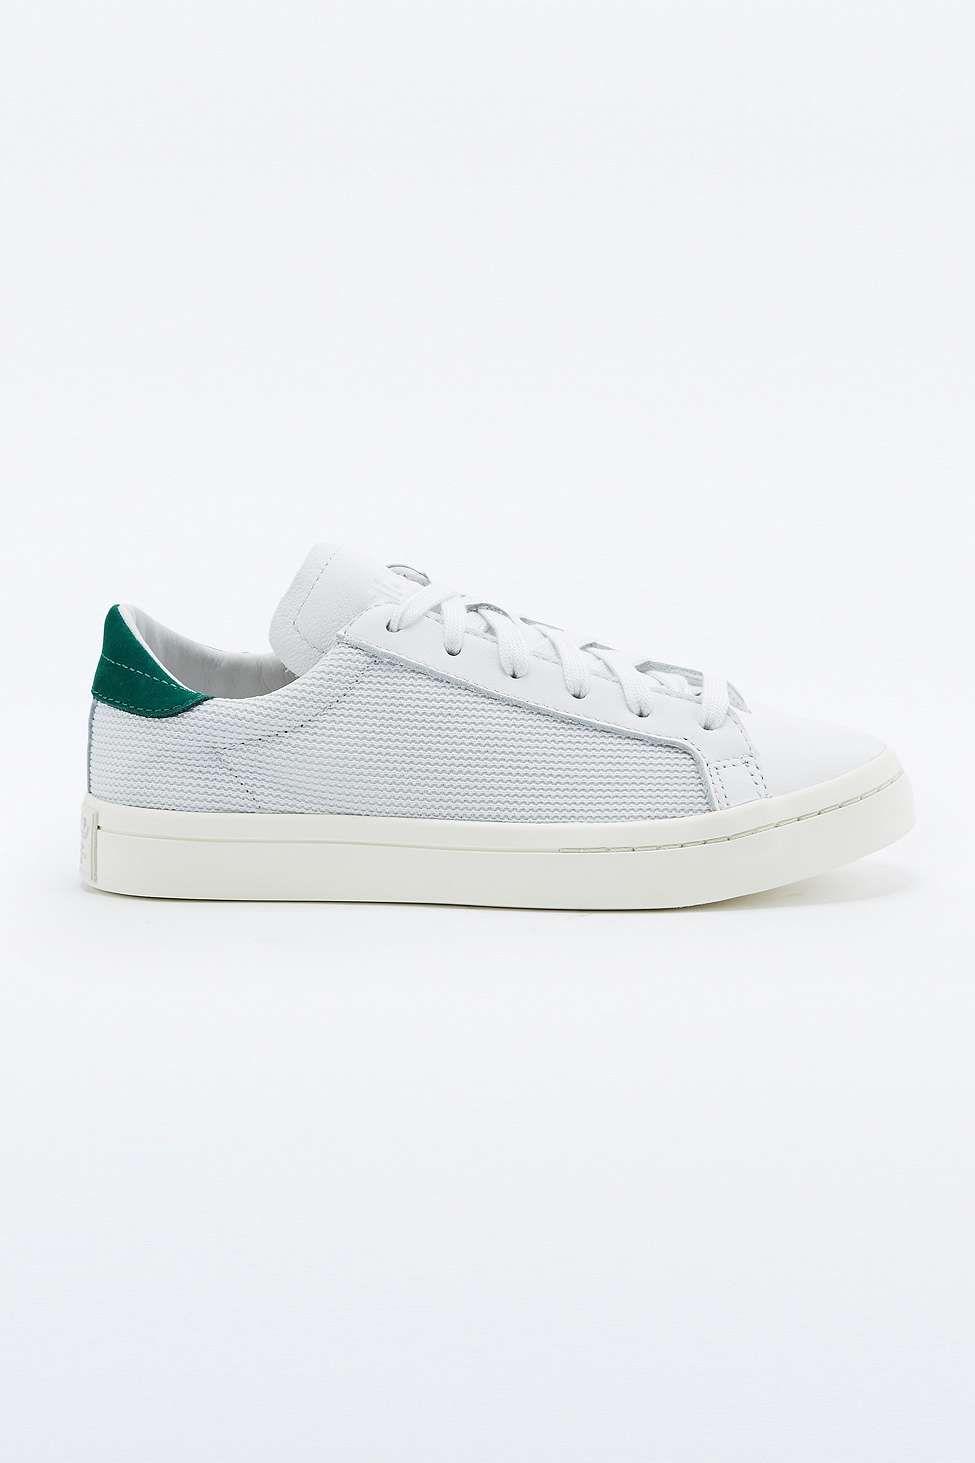 Adidas Originals Court Vantage White And Green Nubuck Trainers Adidas Originals Sneaker Sneaker Adidas Originals